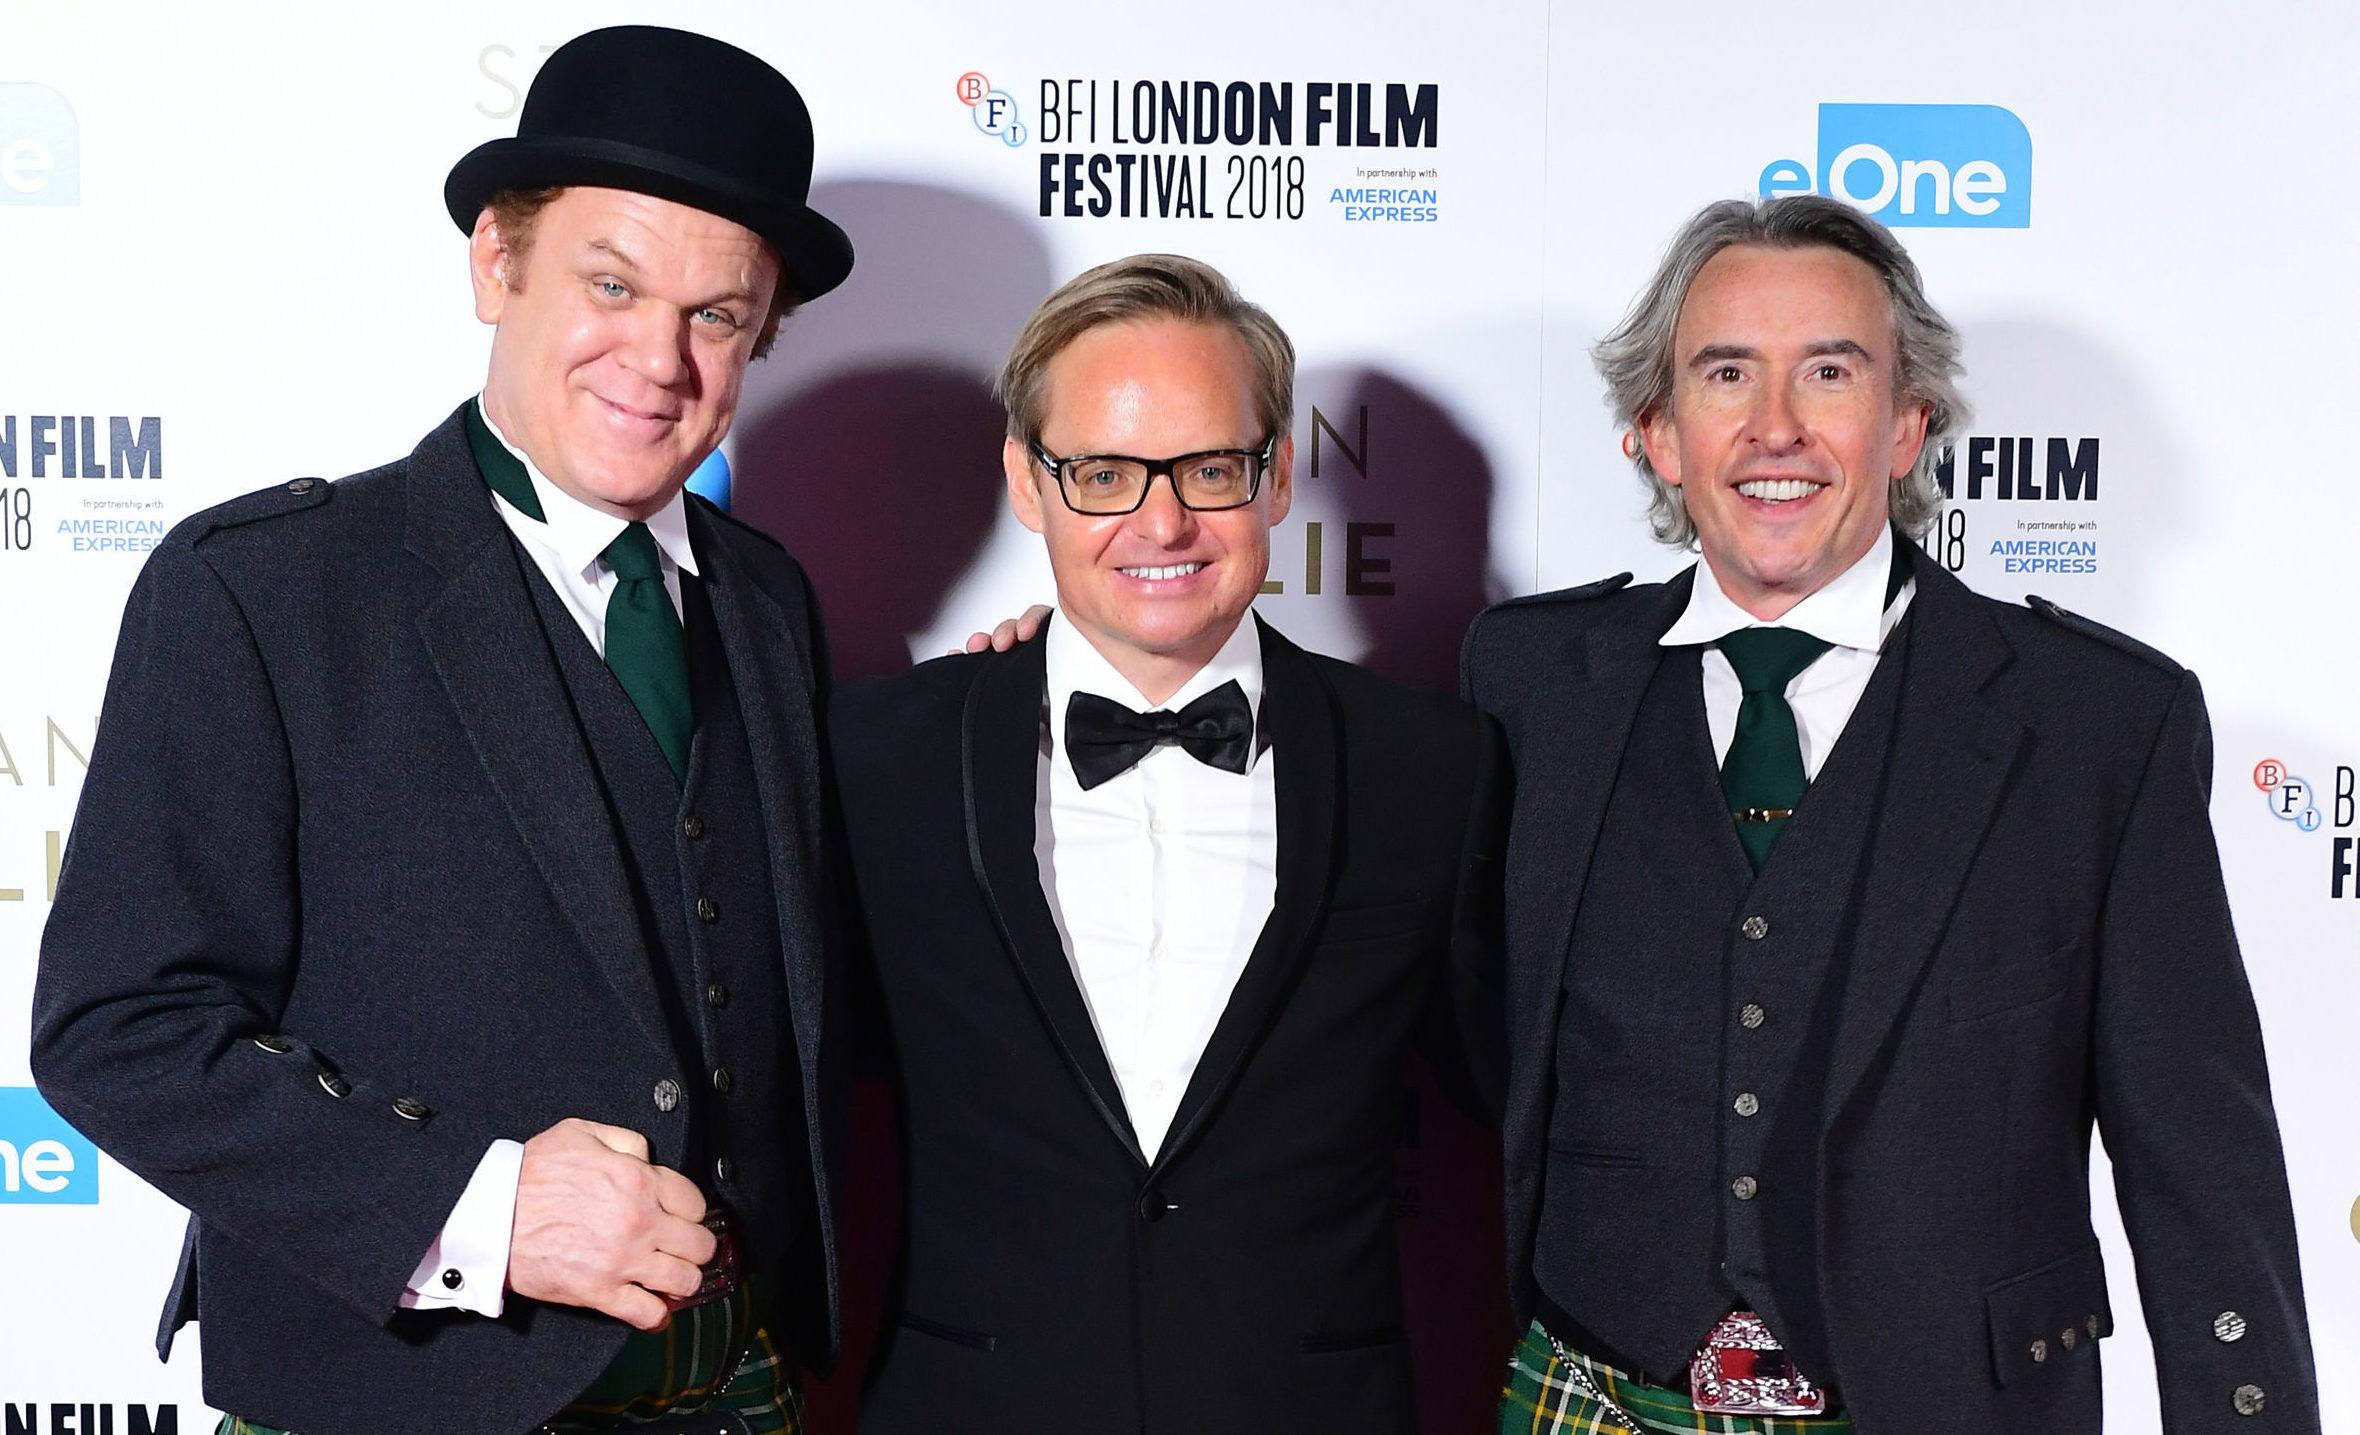 John C. Reilly, Jon S.Baird and Steve Coogan on the red carpet (PA)